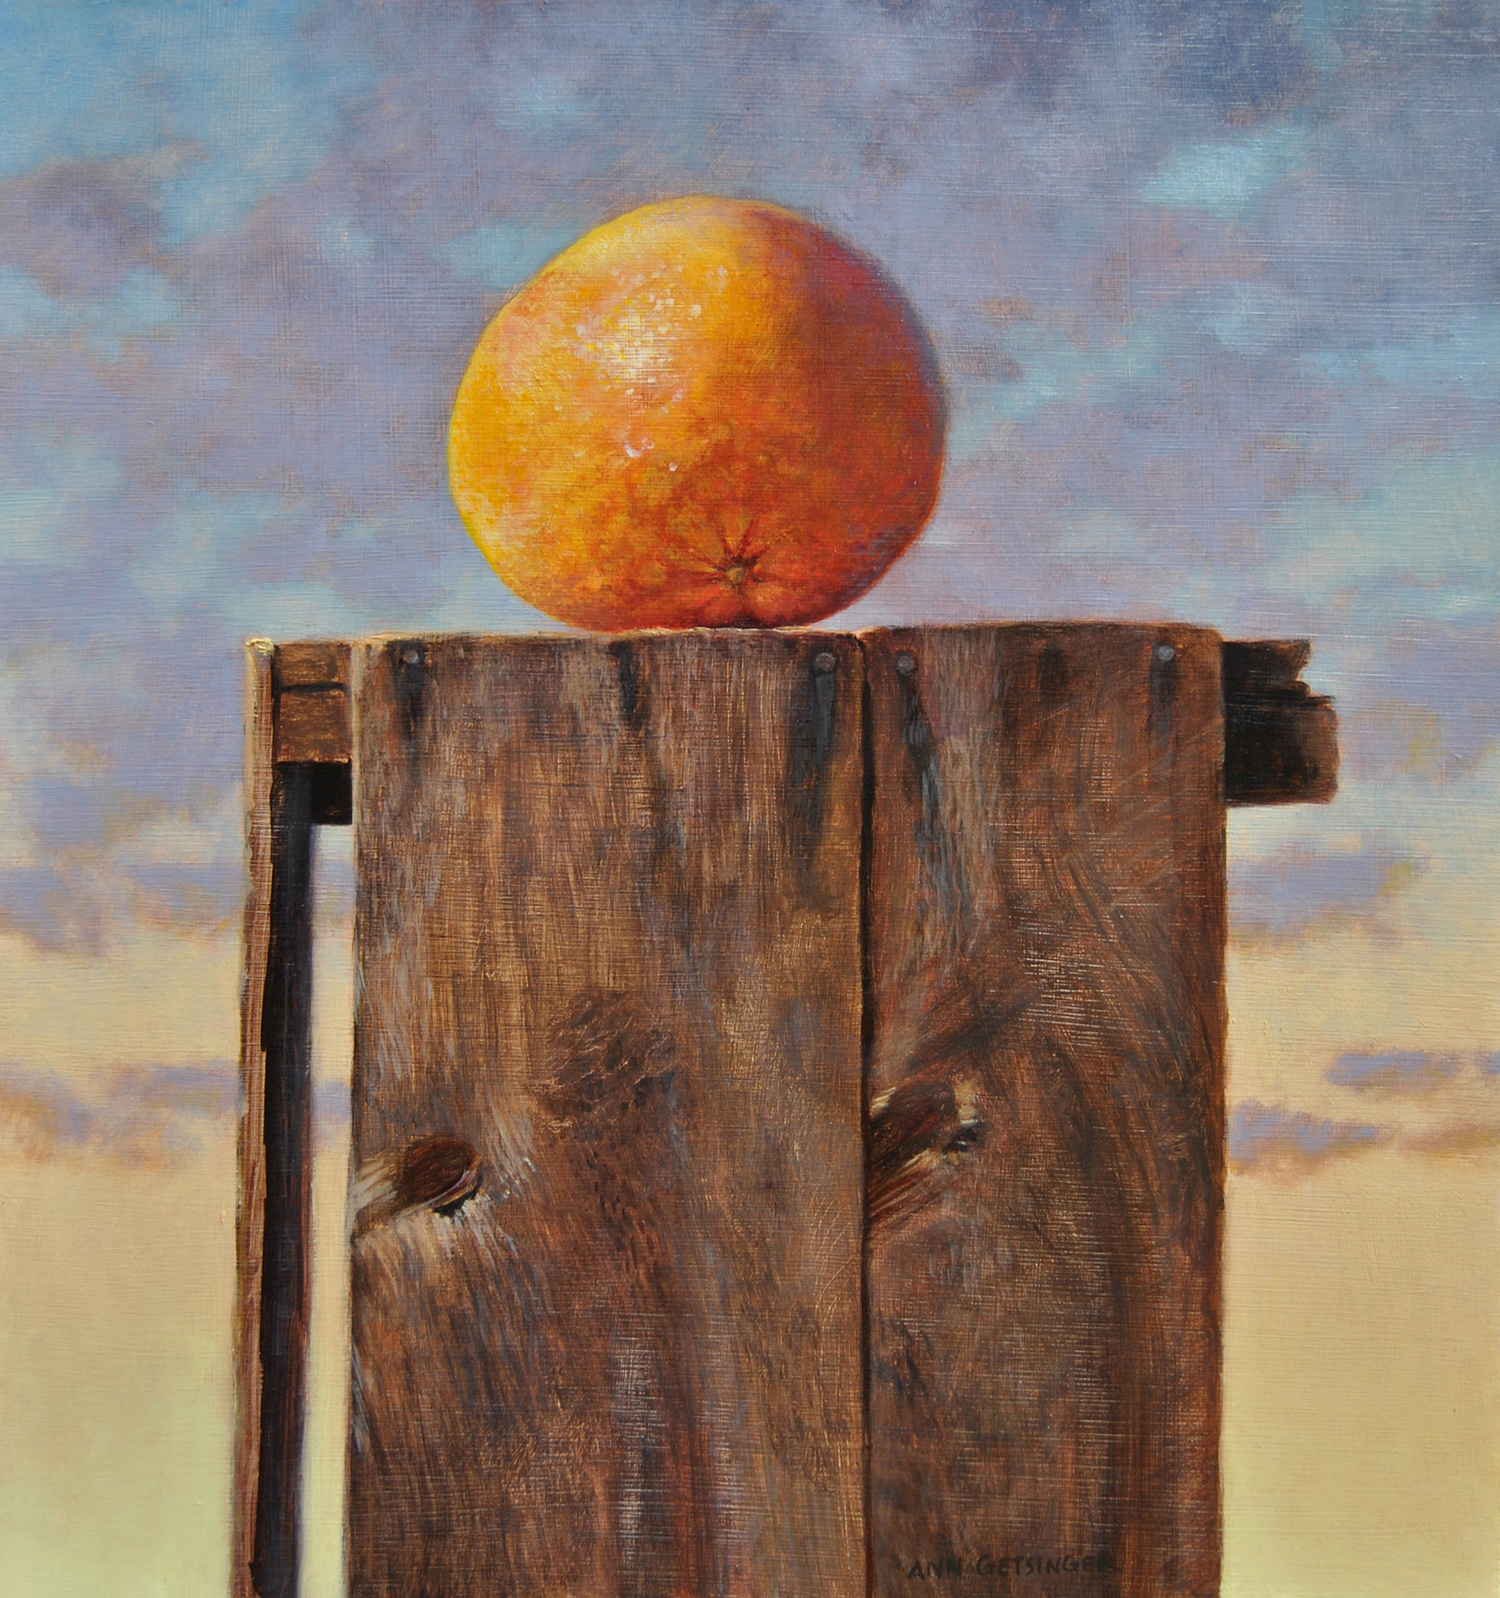 Grapefruit on Crate web.jpg